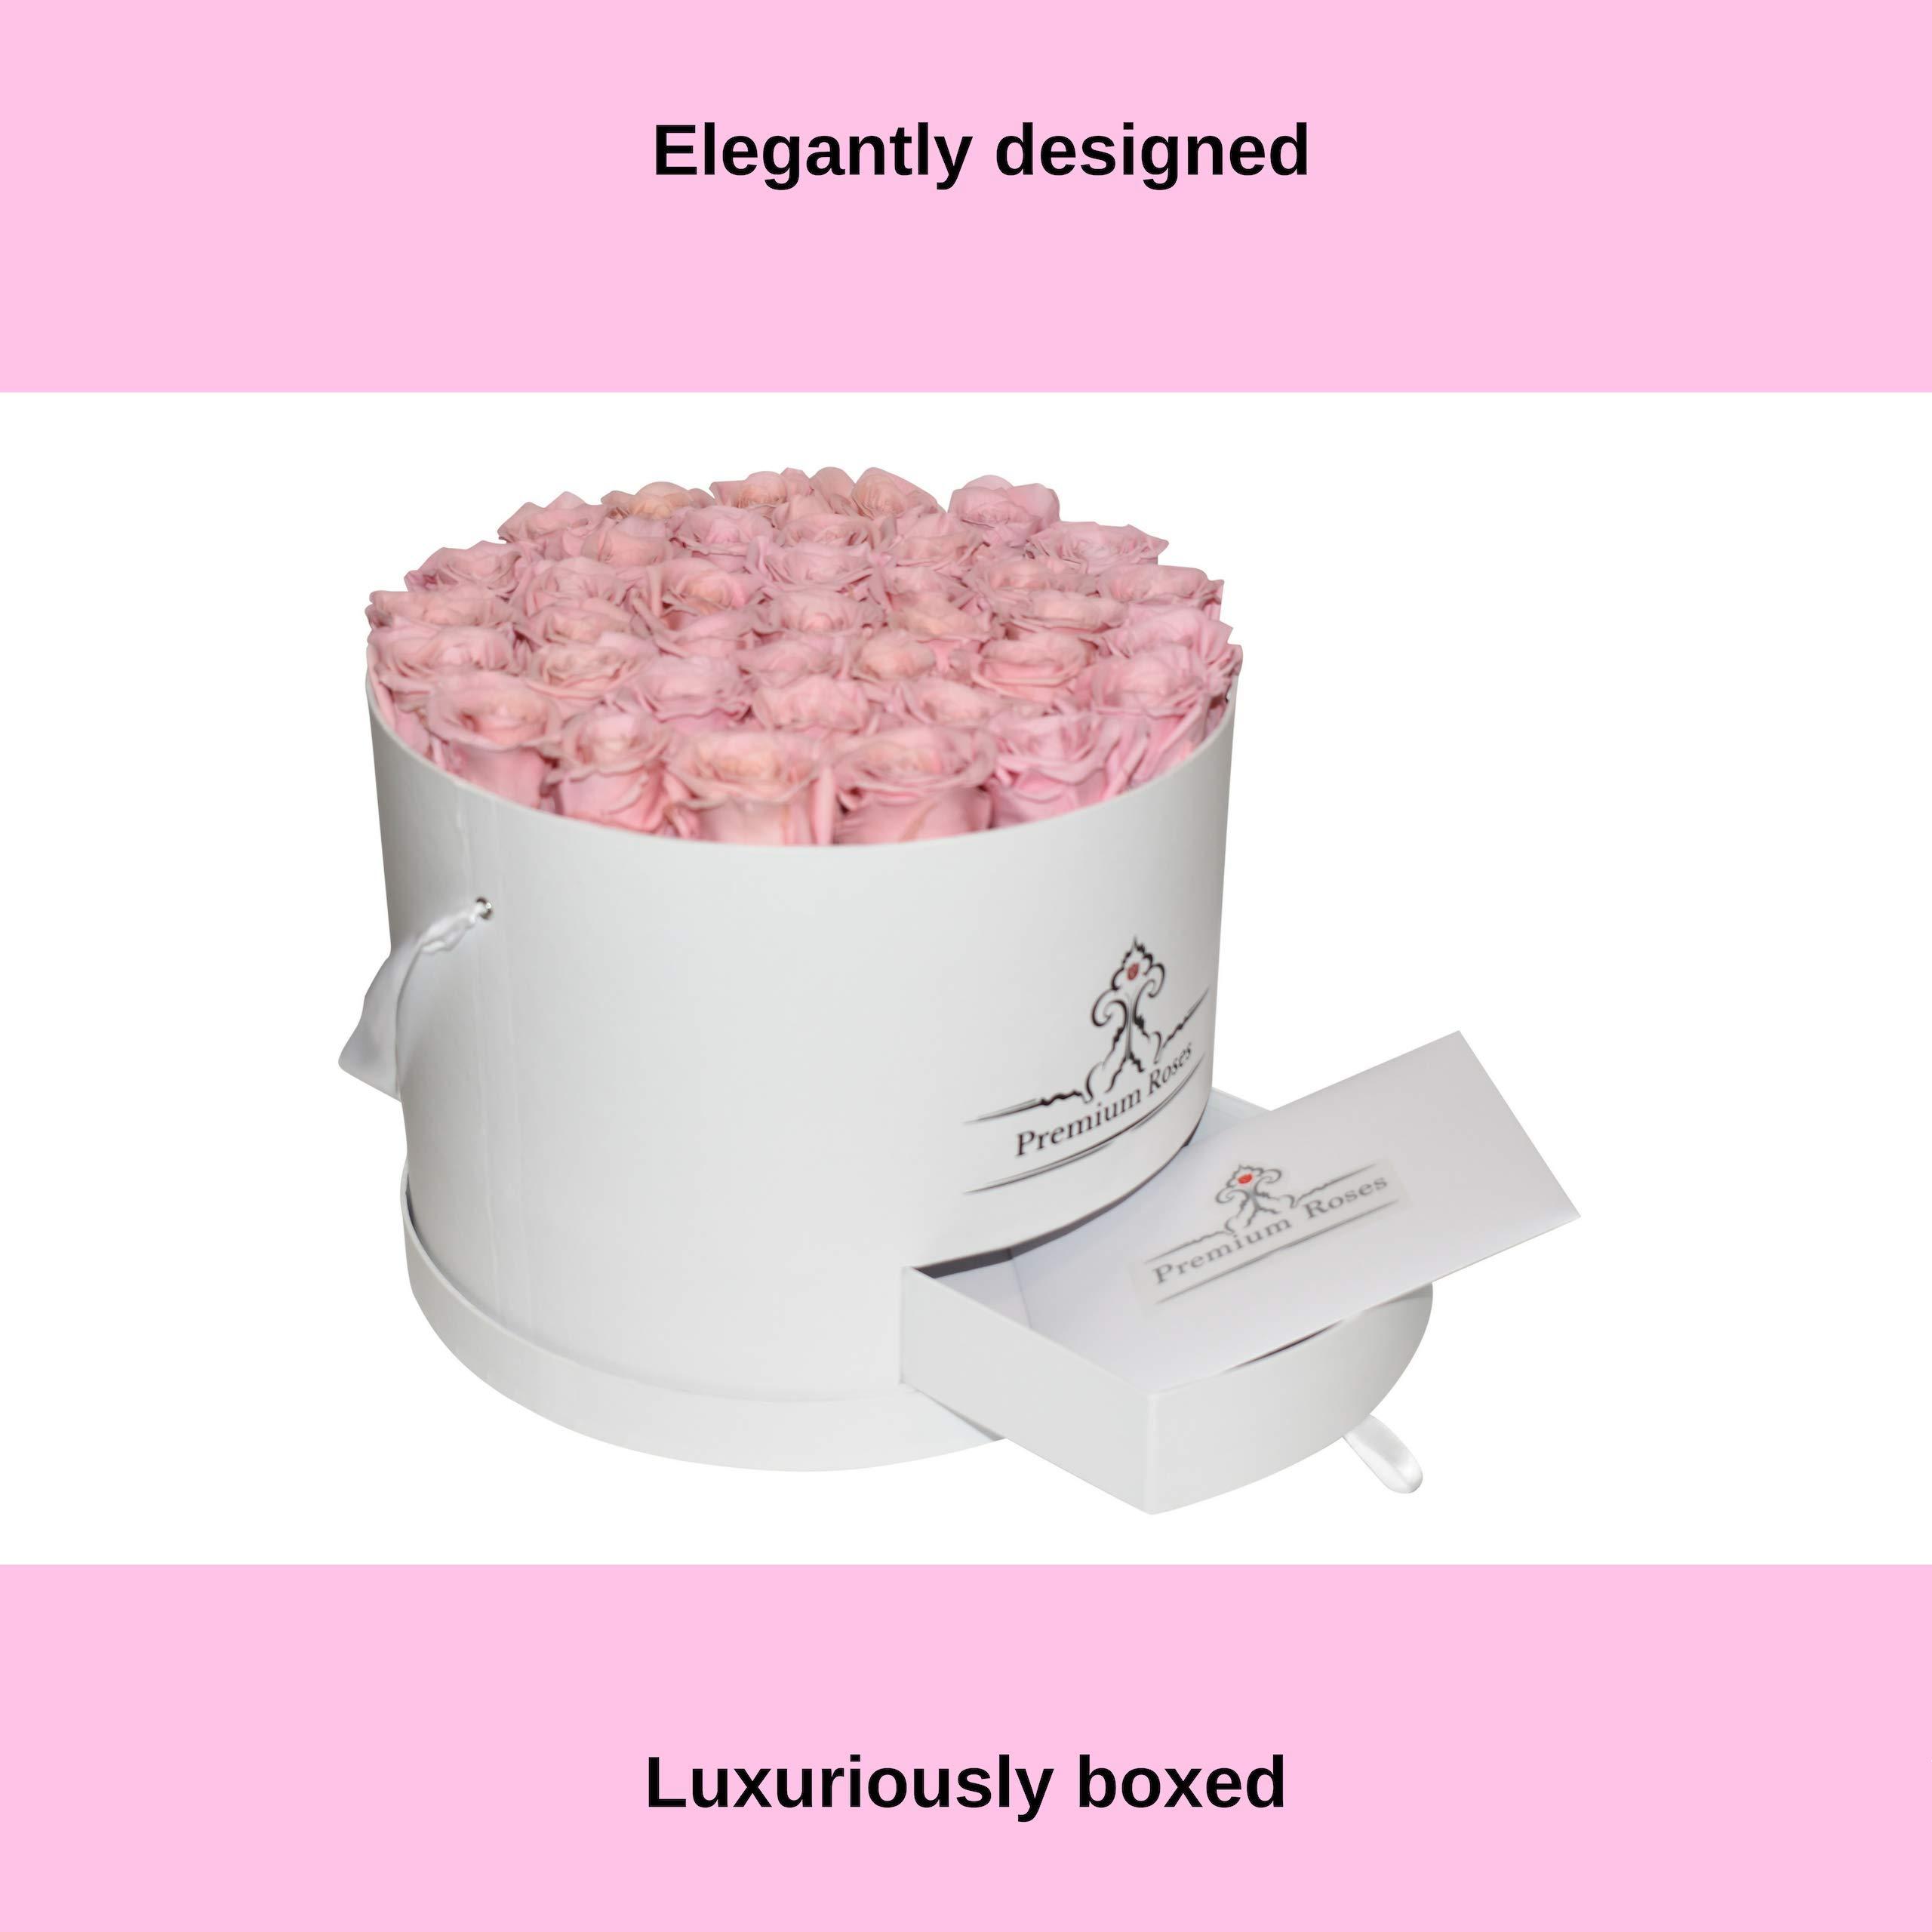 Premium Roses| Model White| Real Roses That Last 365 Days| Fresh Flowers (White Box, Large) by Premium Roses (Image #6)